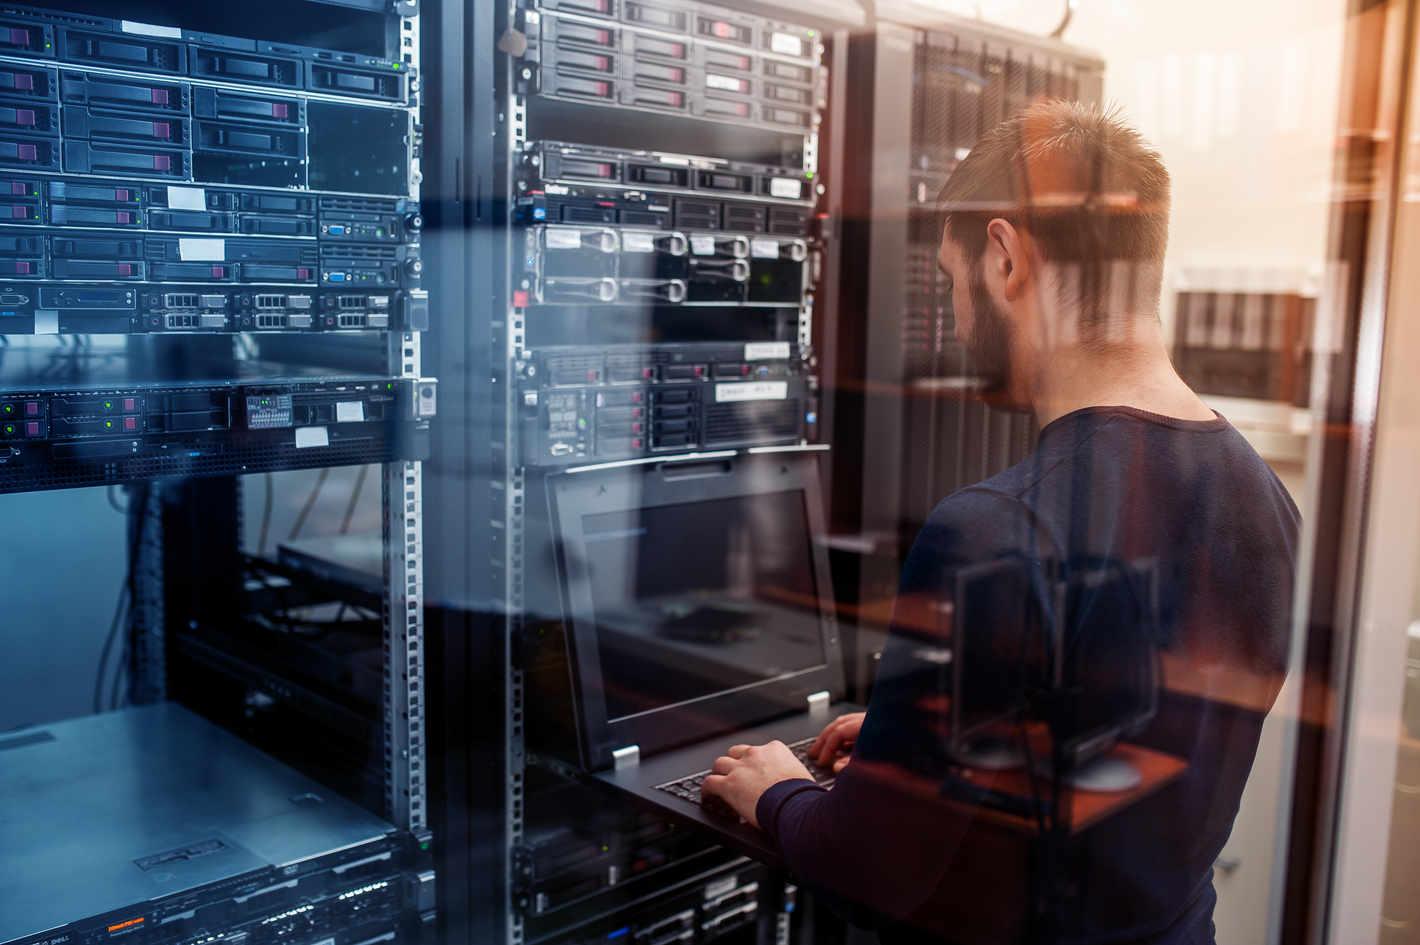 Server Install and Upgrades